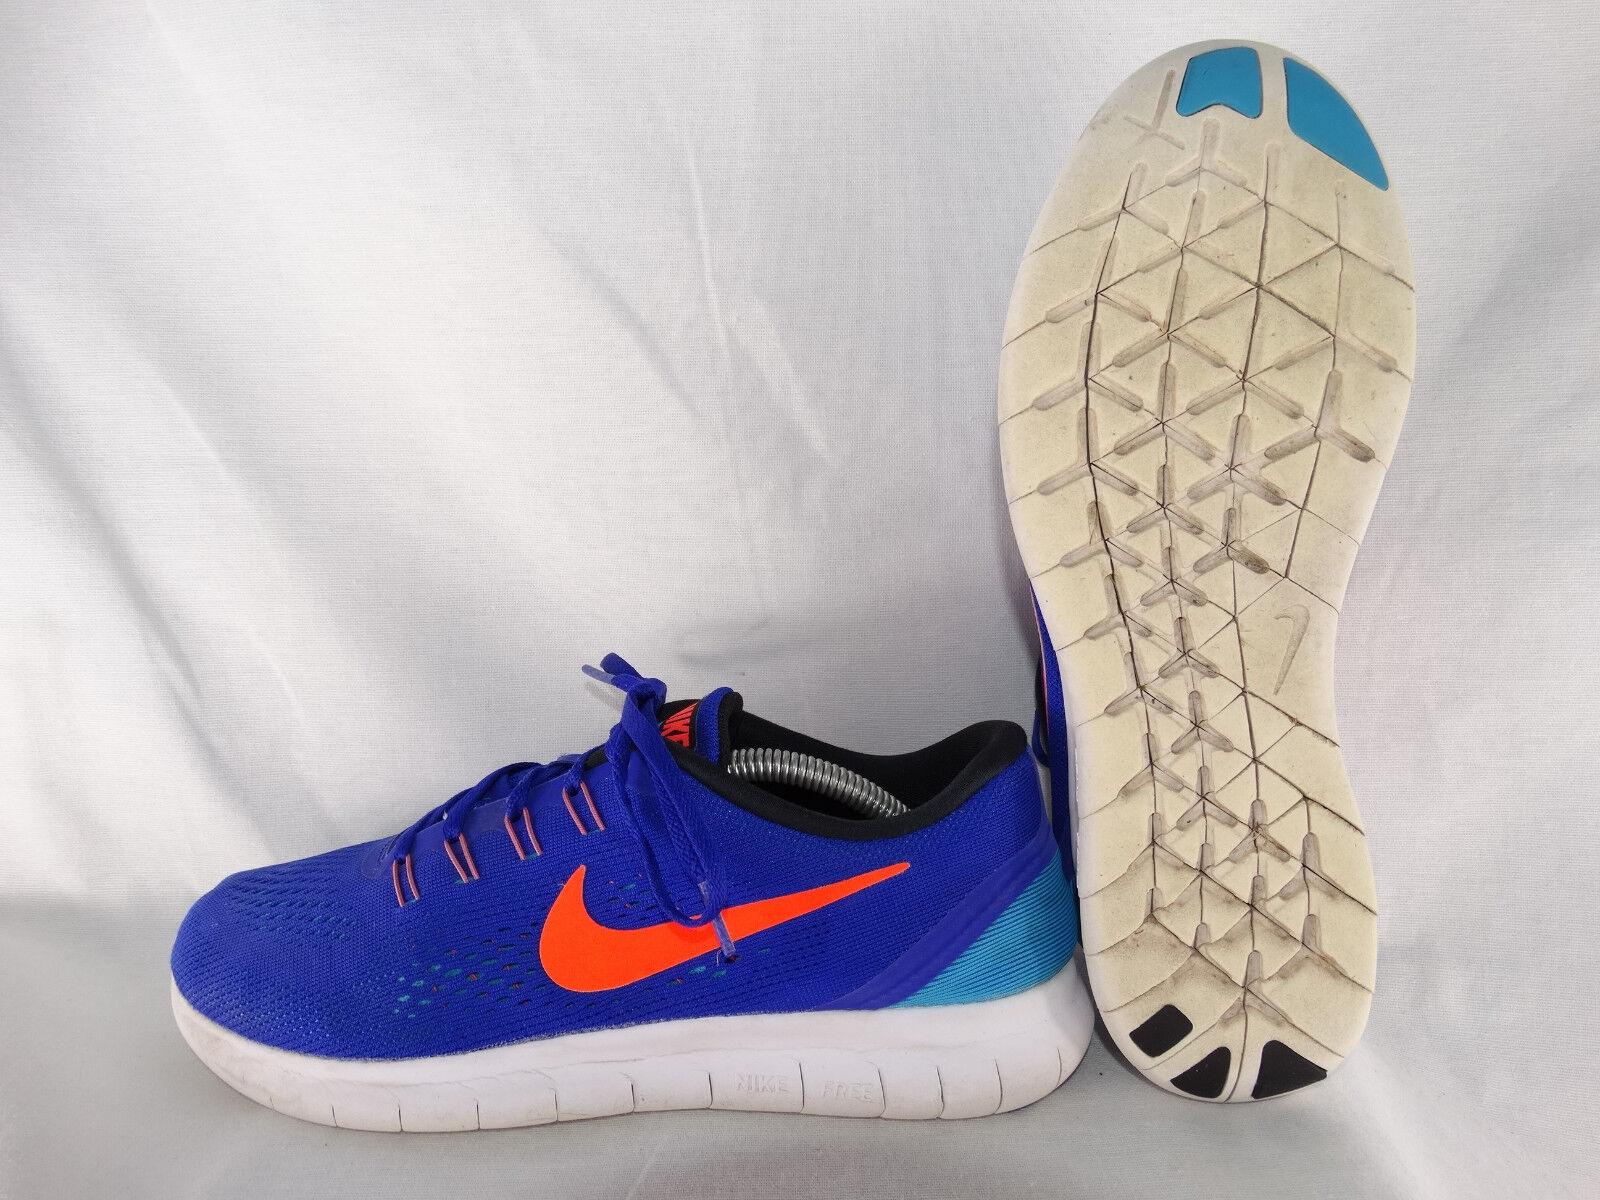 Nike Free RN Laufschuhe 831508-401 blau-orange EU 42 US 8,5